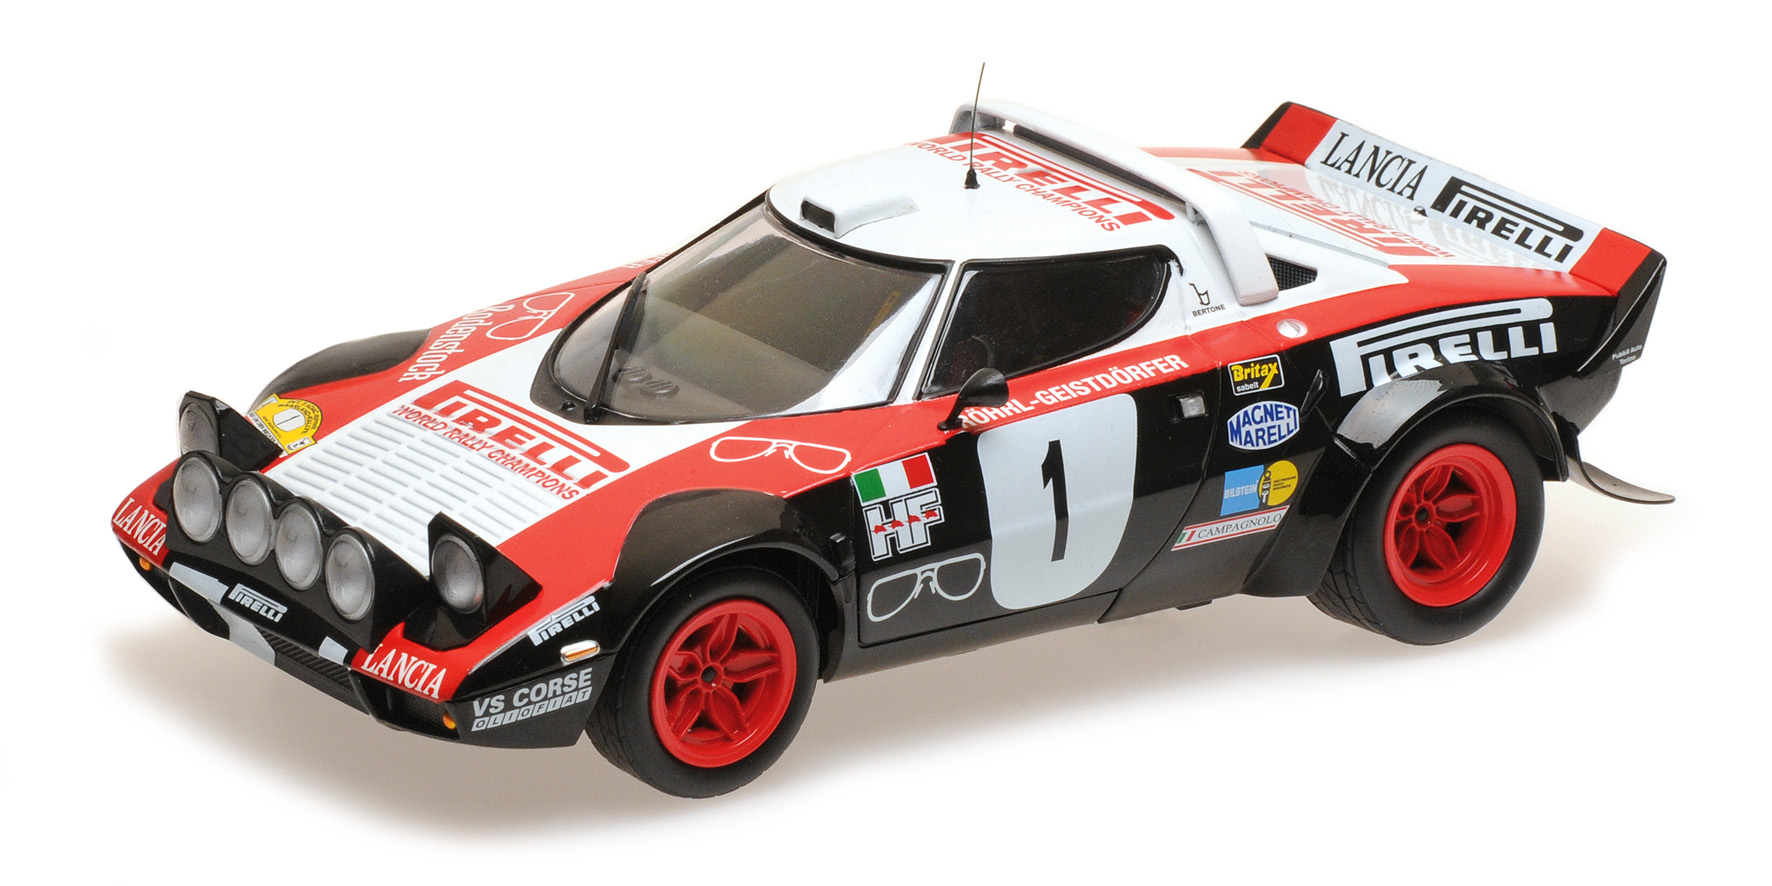 Lancia Stratos Lancia Pirelli Röhrl Geistdörfer Winners Dynavit Saarland Rallye 1978 1/18